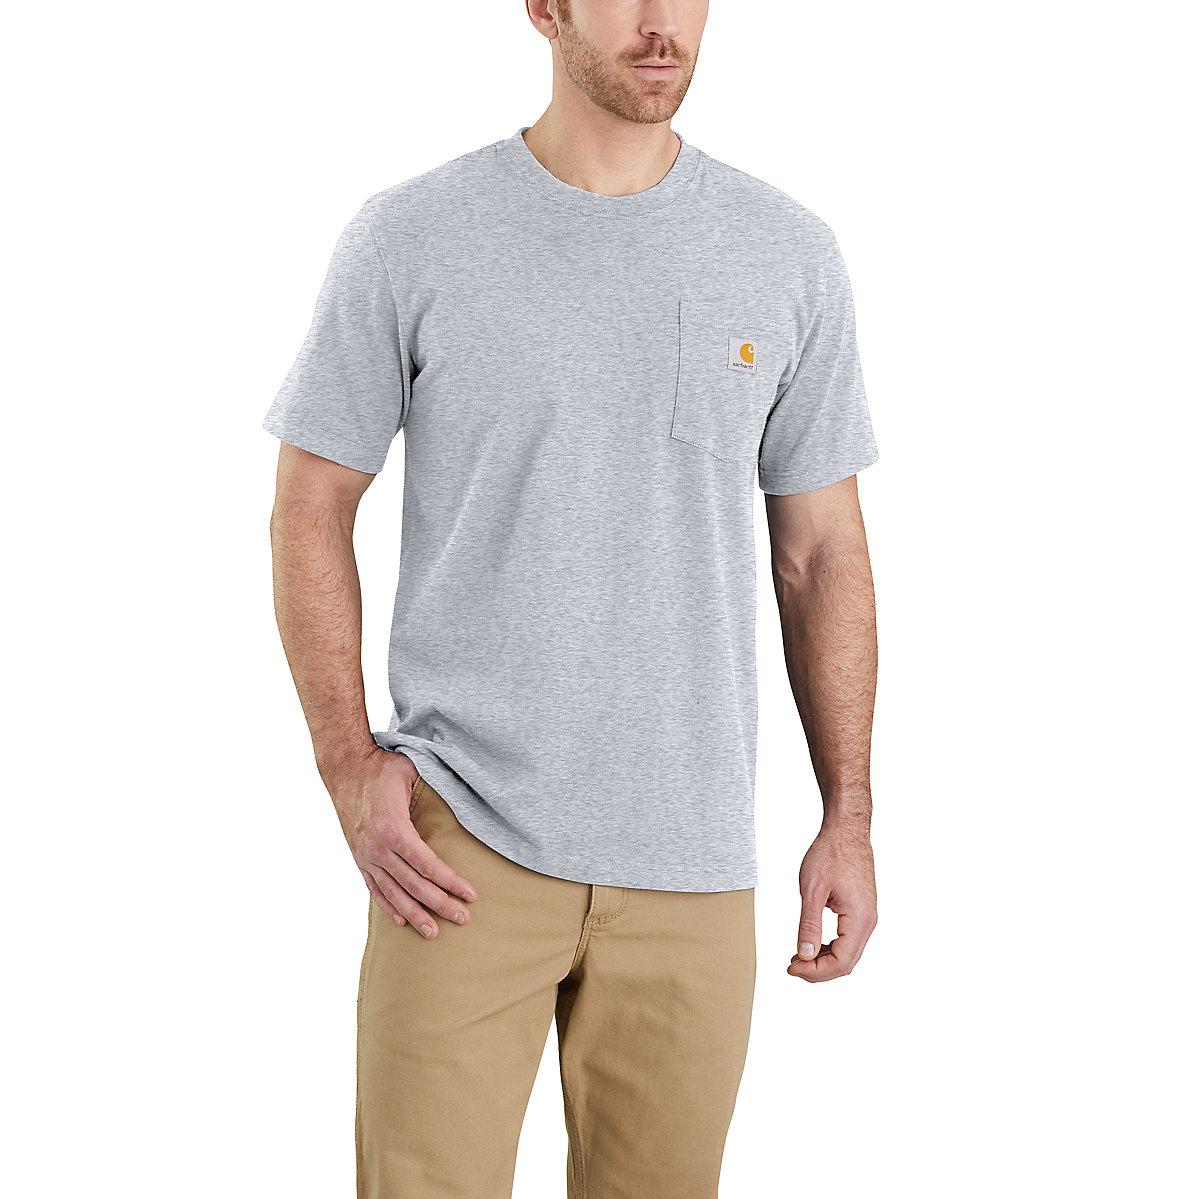 ae3ea34de Men′s WORKWEAR POCKET SHORT-SLEEVE T-SHIRT 103296 | Carhartt